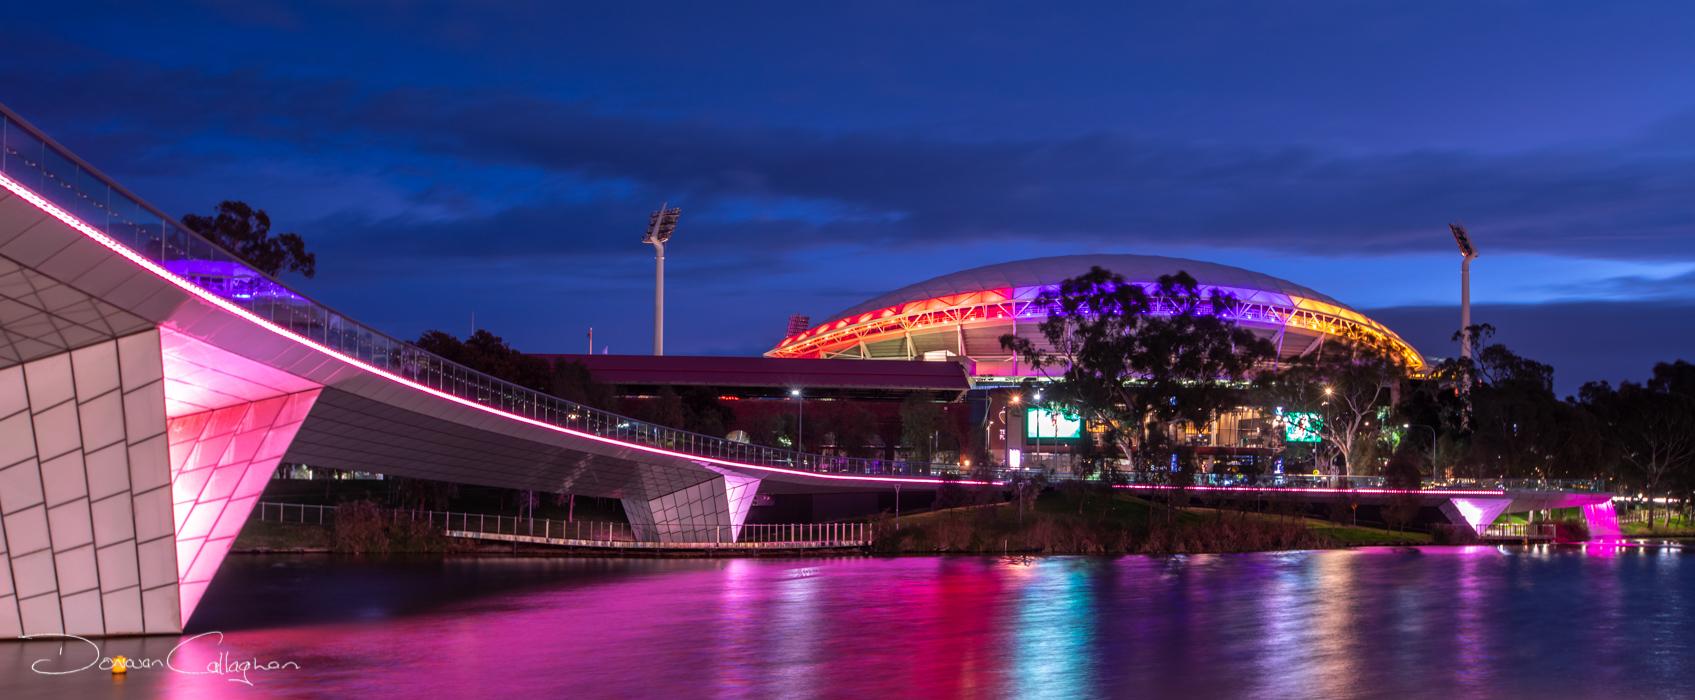 Adelaide Oval Sunrise, Australia